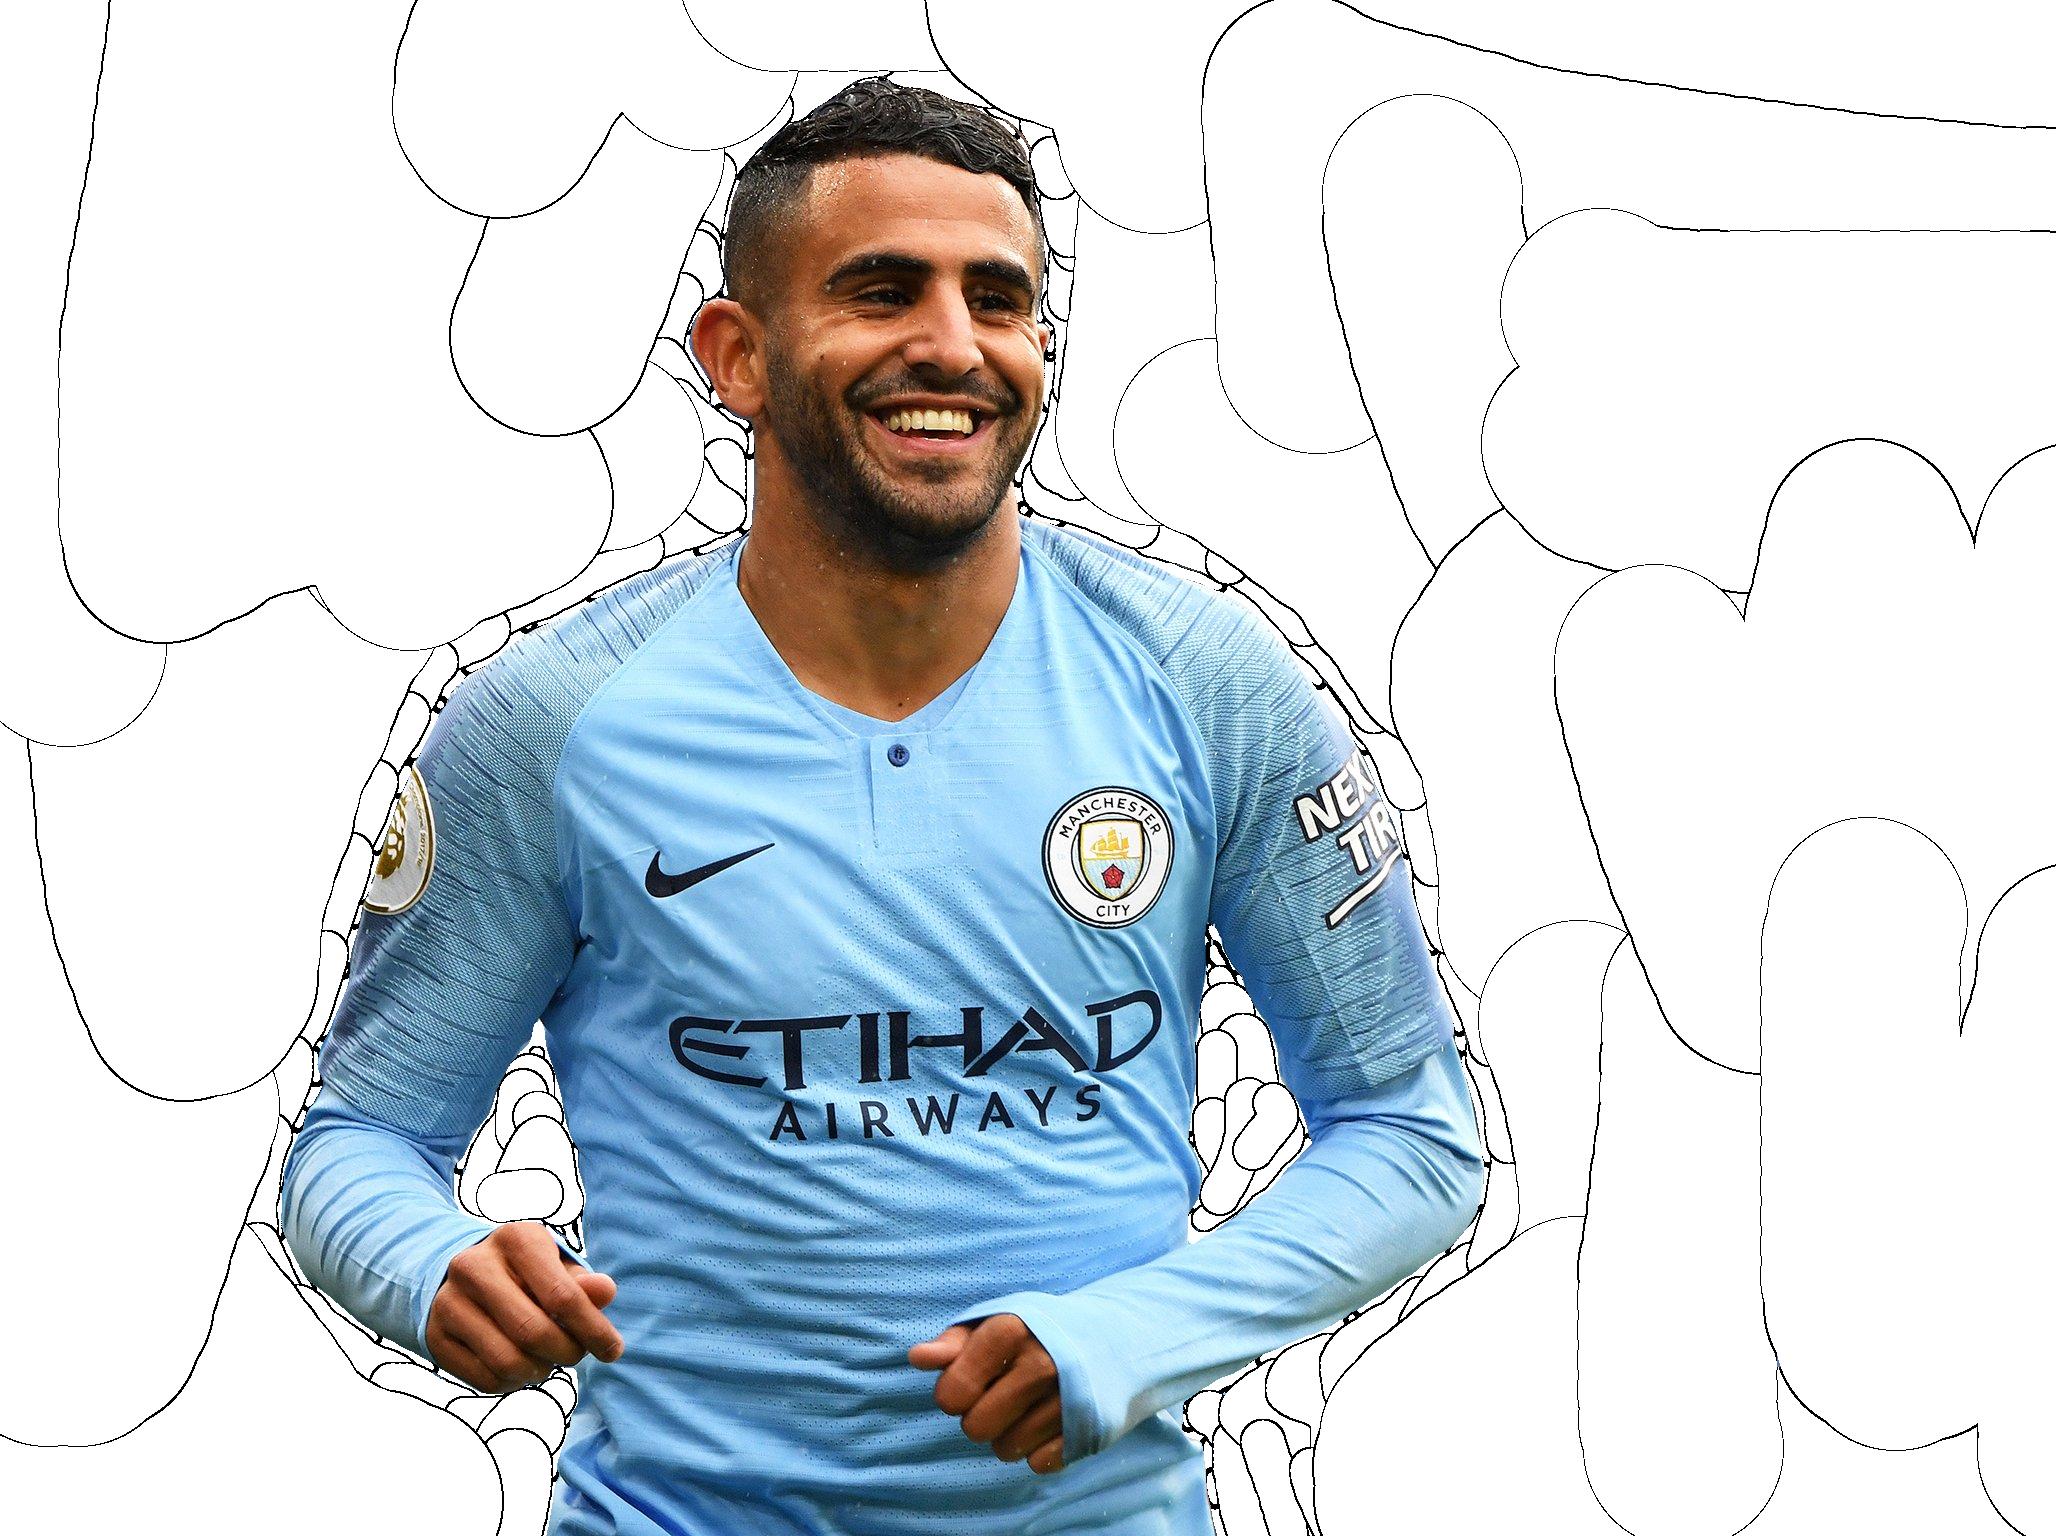 Mahrez Render (Manchester City) by tychorenders on DeviantArt